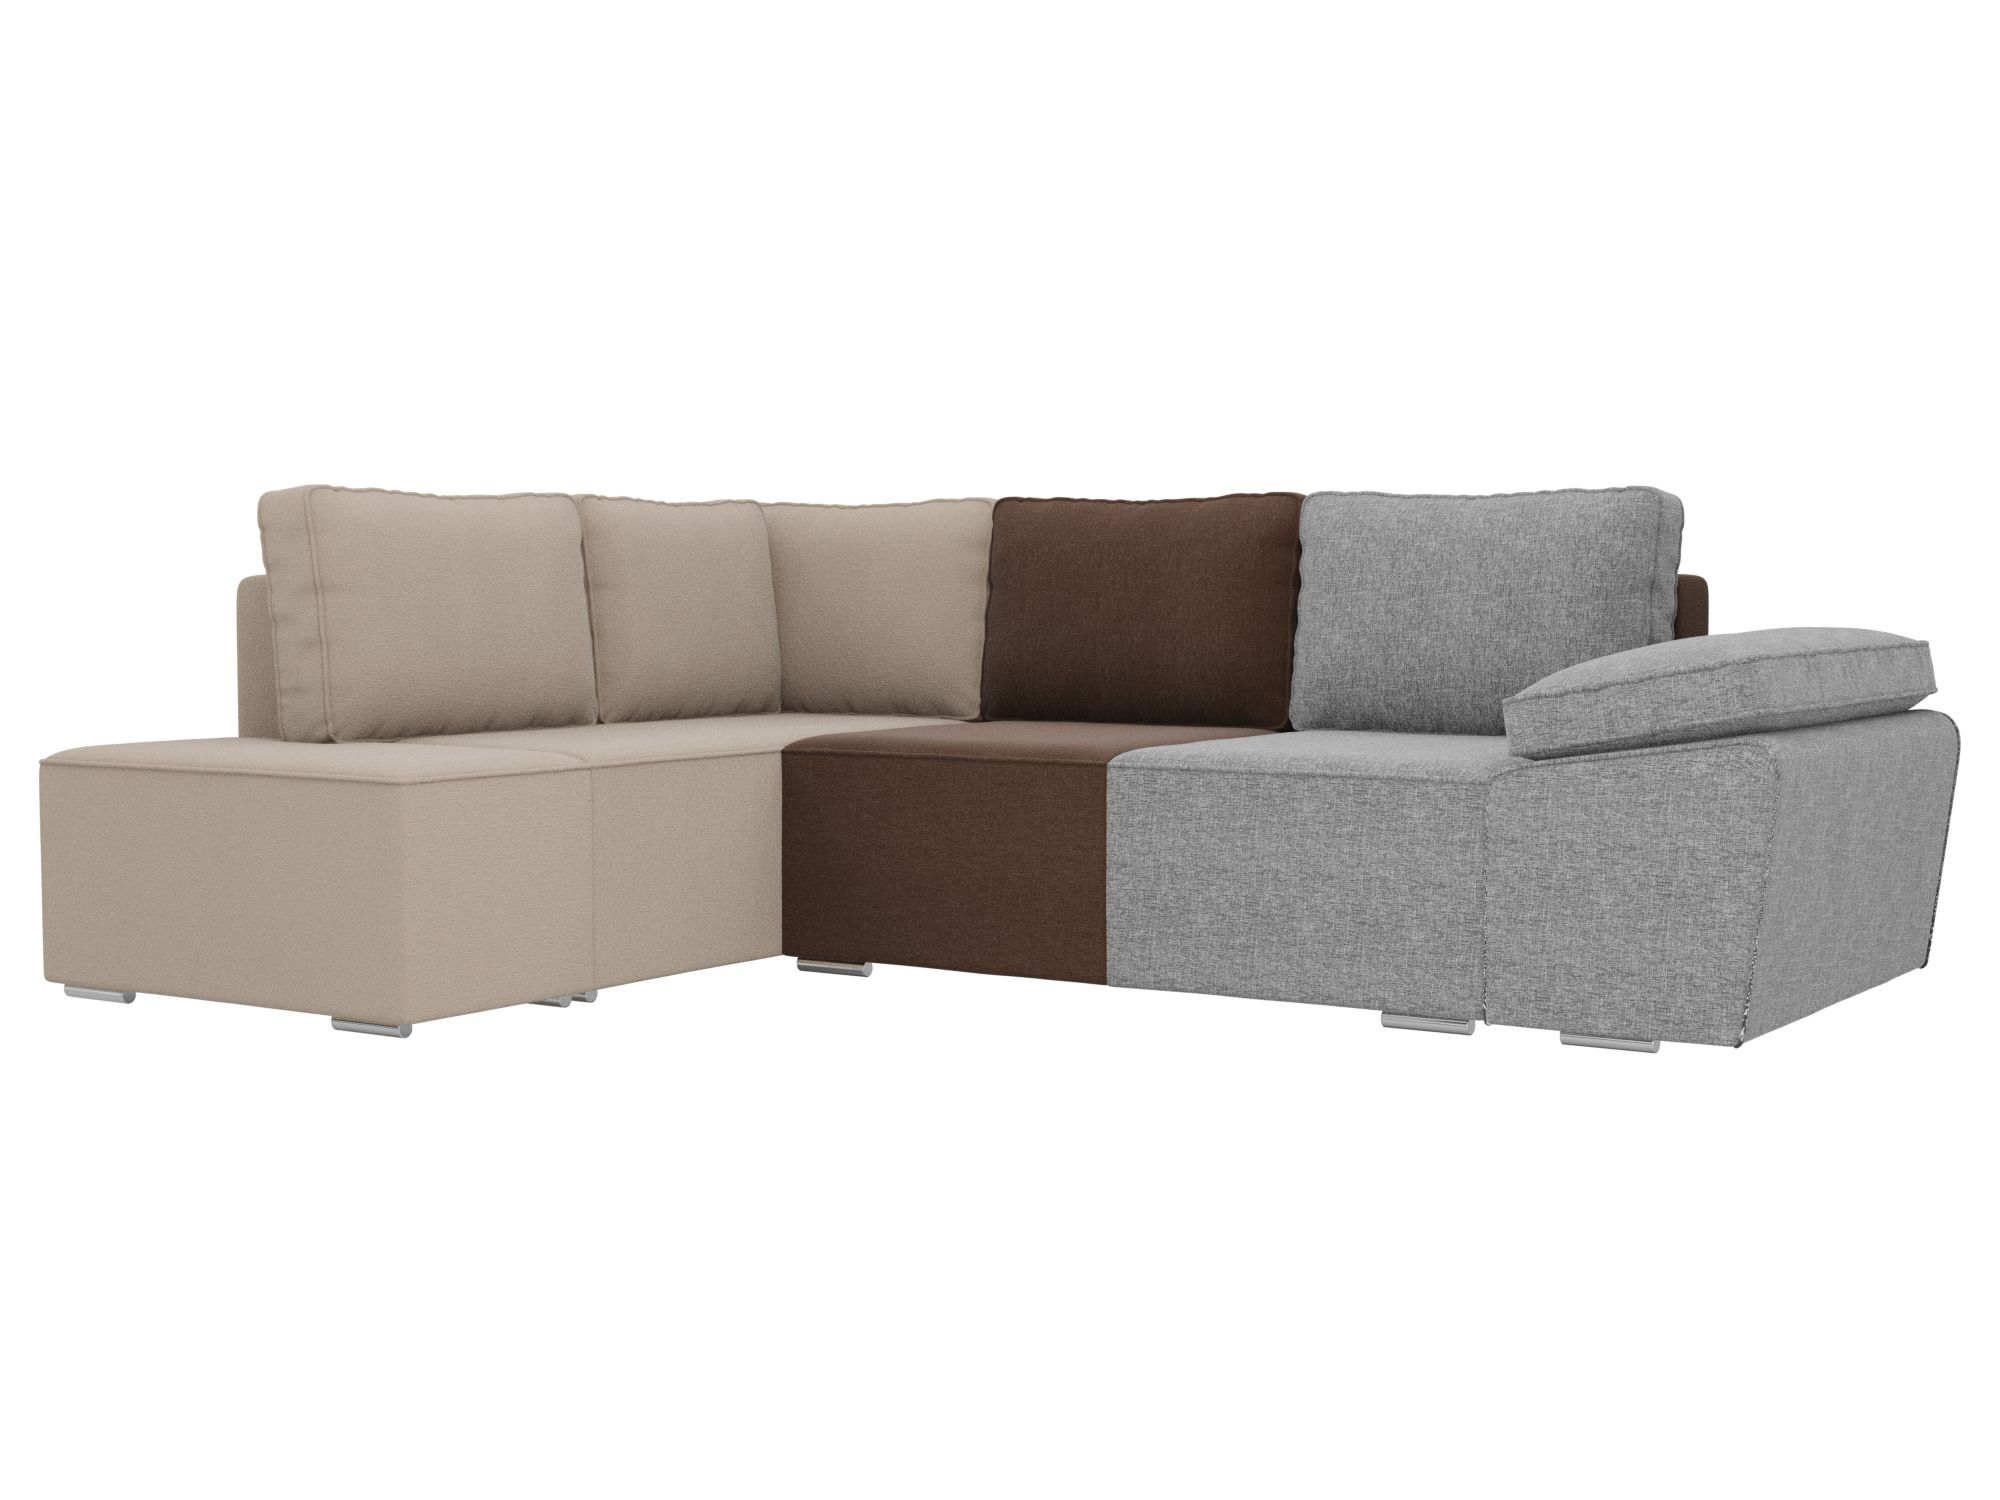 Угловой диван Хавьер, рогожка,левый угол